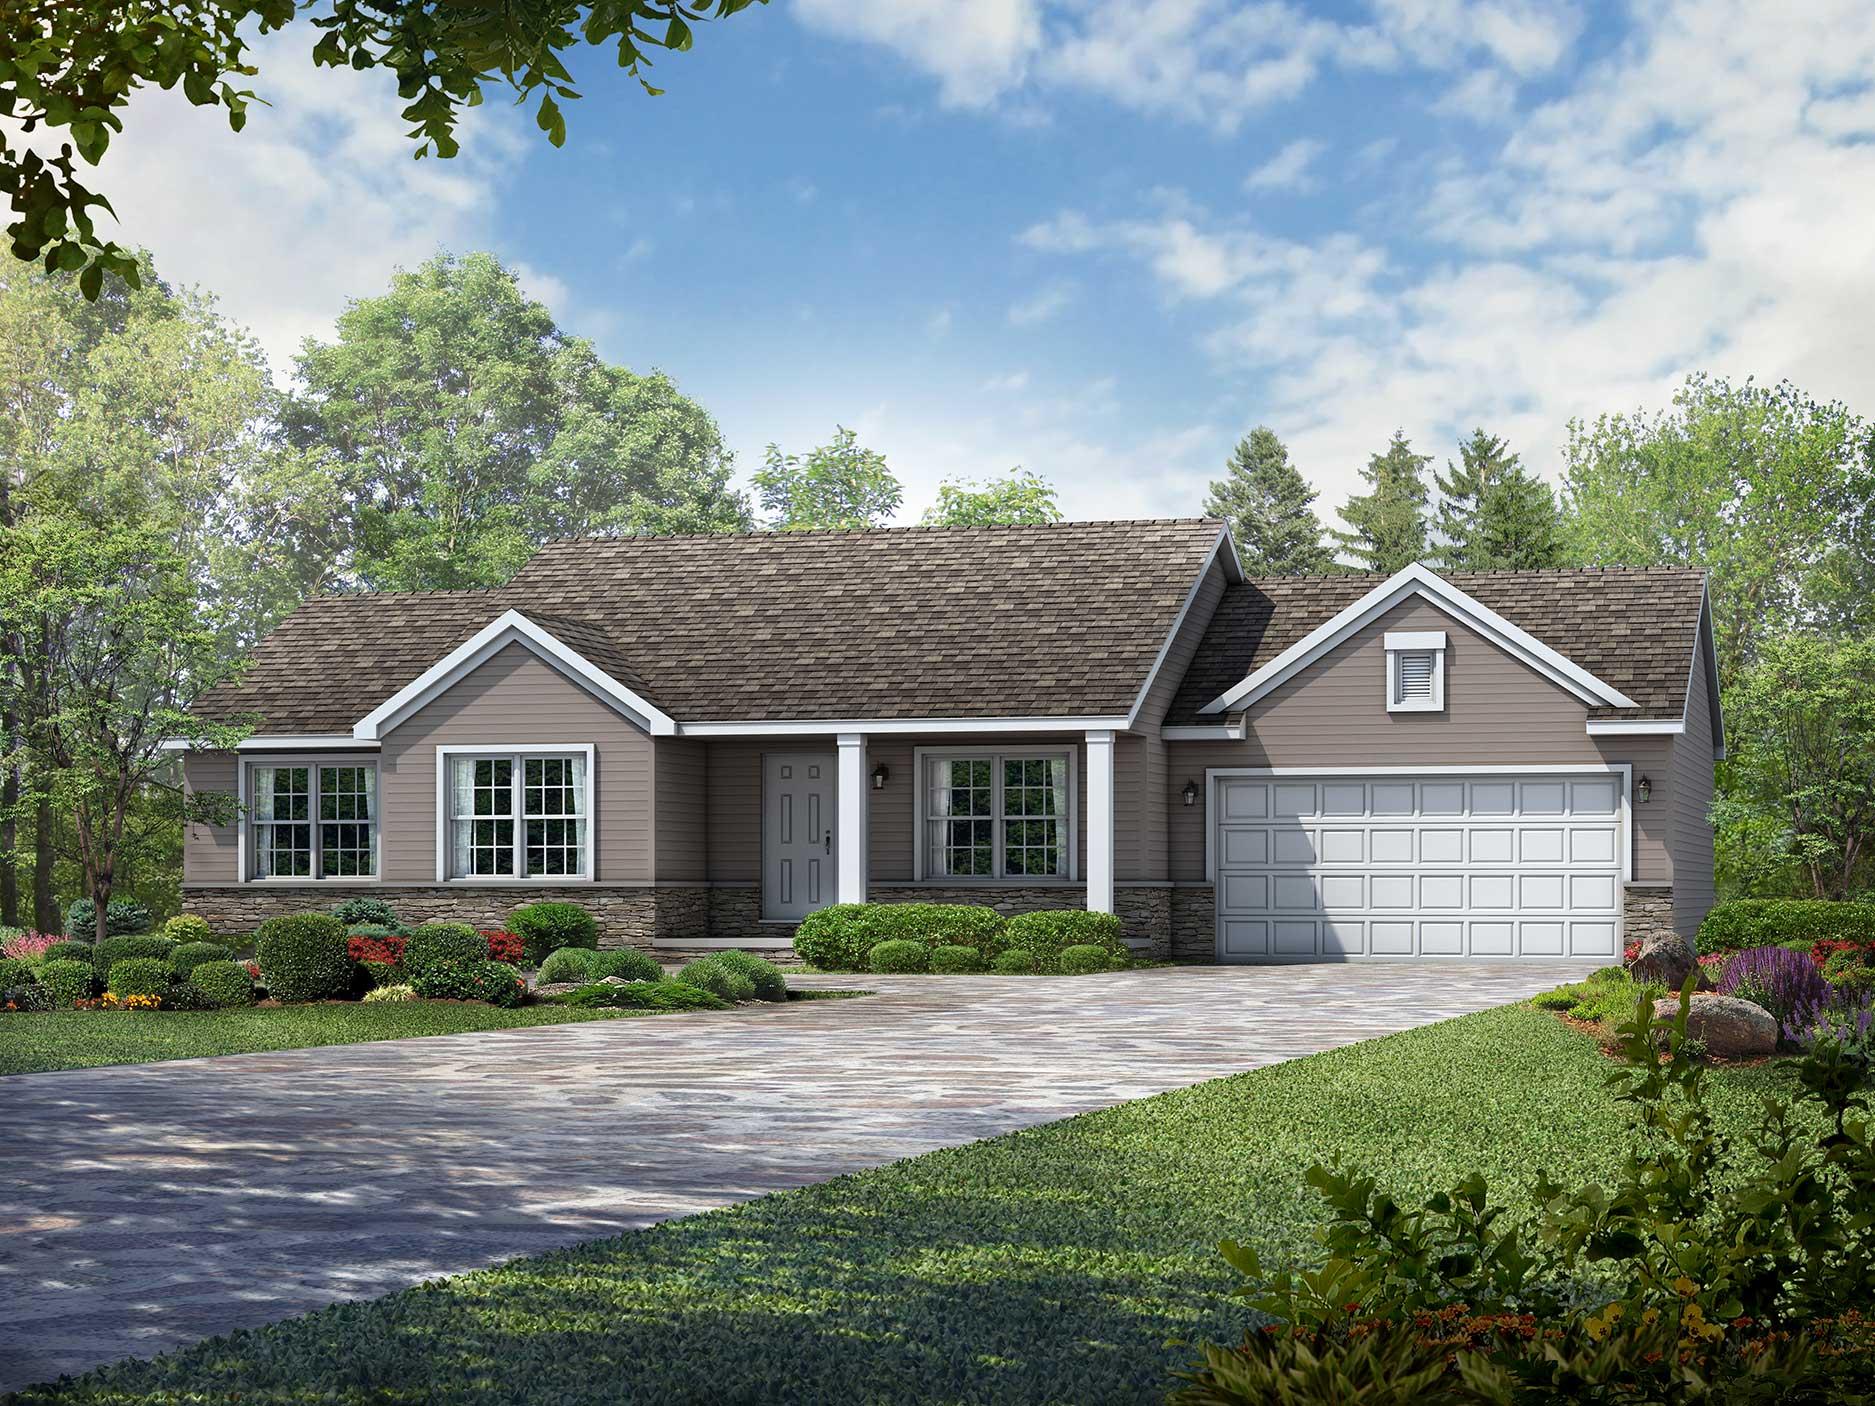 Wayne Homes Ranch Floor Plans: Simple Floor Plans For Your Custom Home: The Bennington